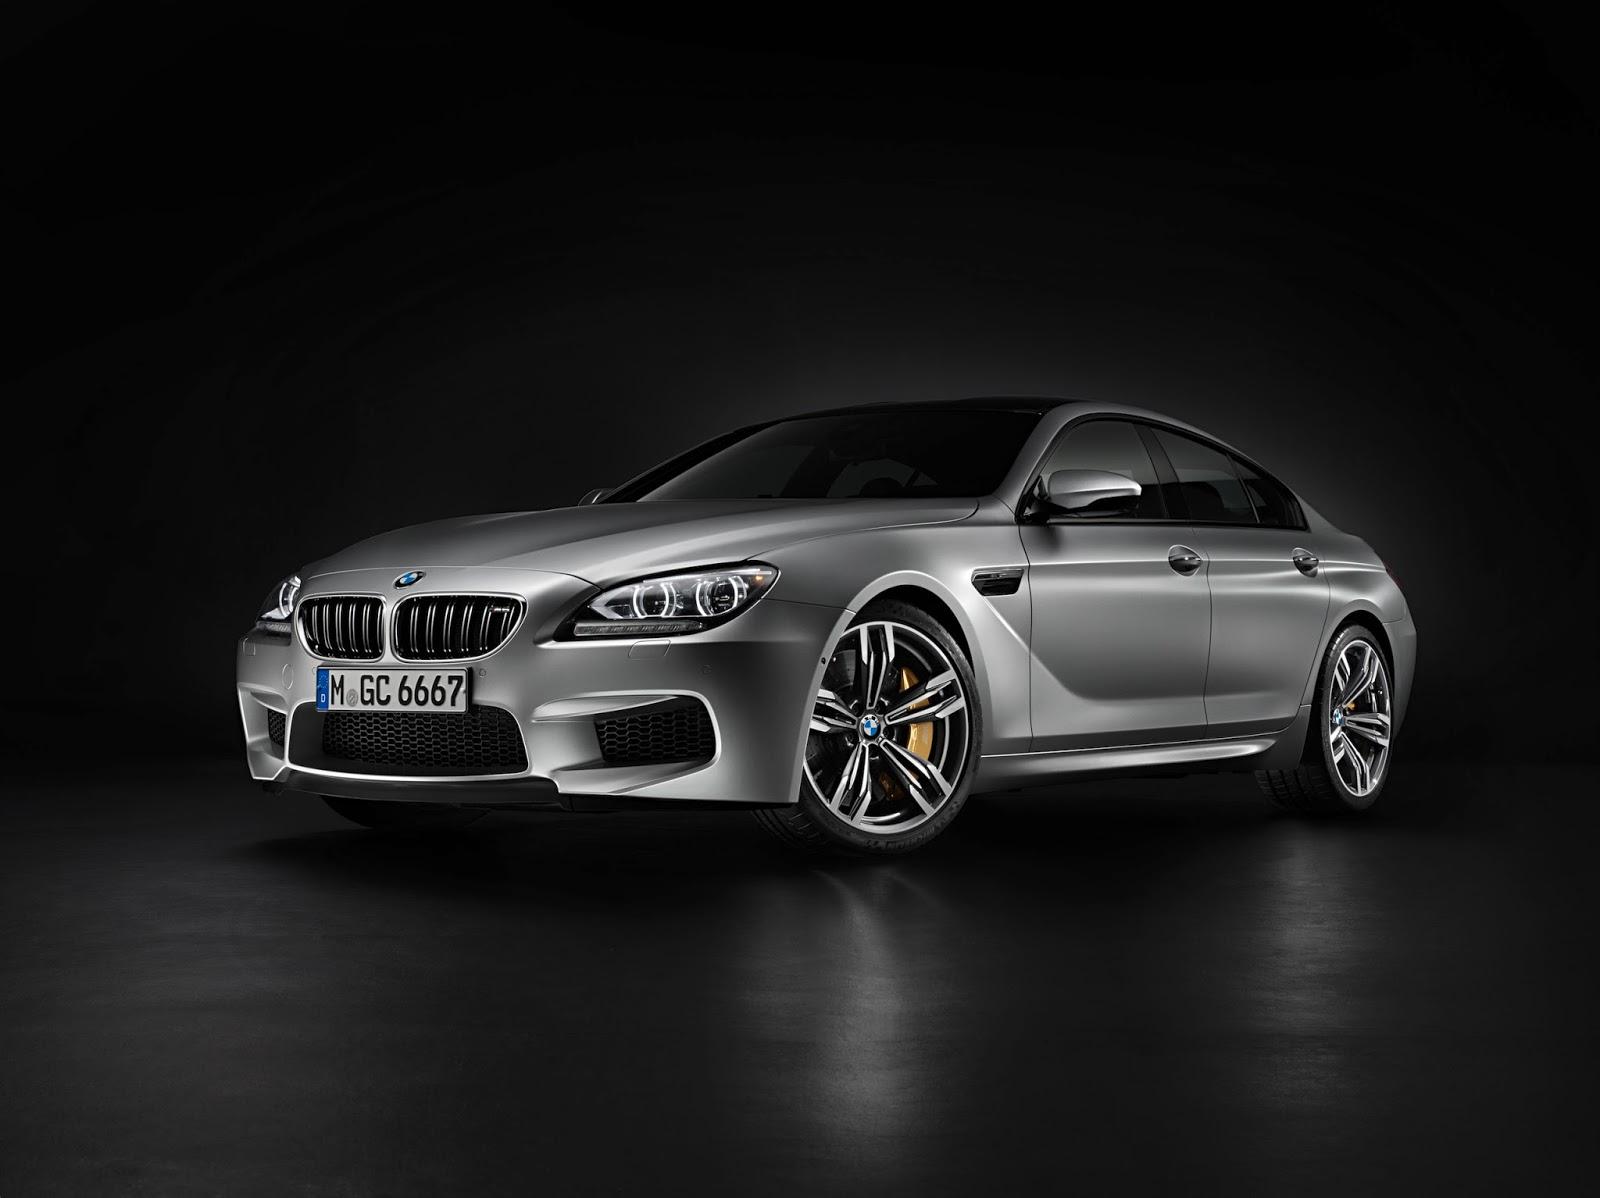 BMWの壁紙 M6グランクーペ